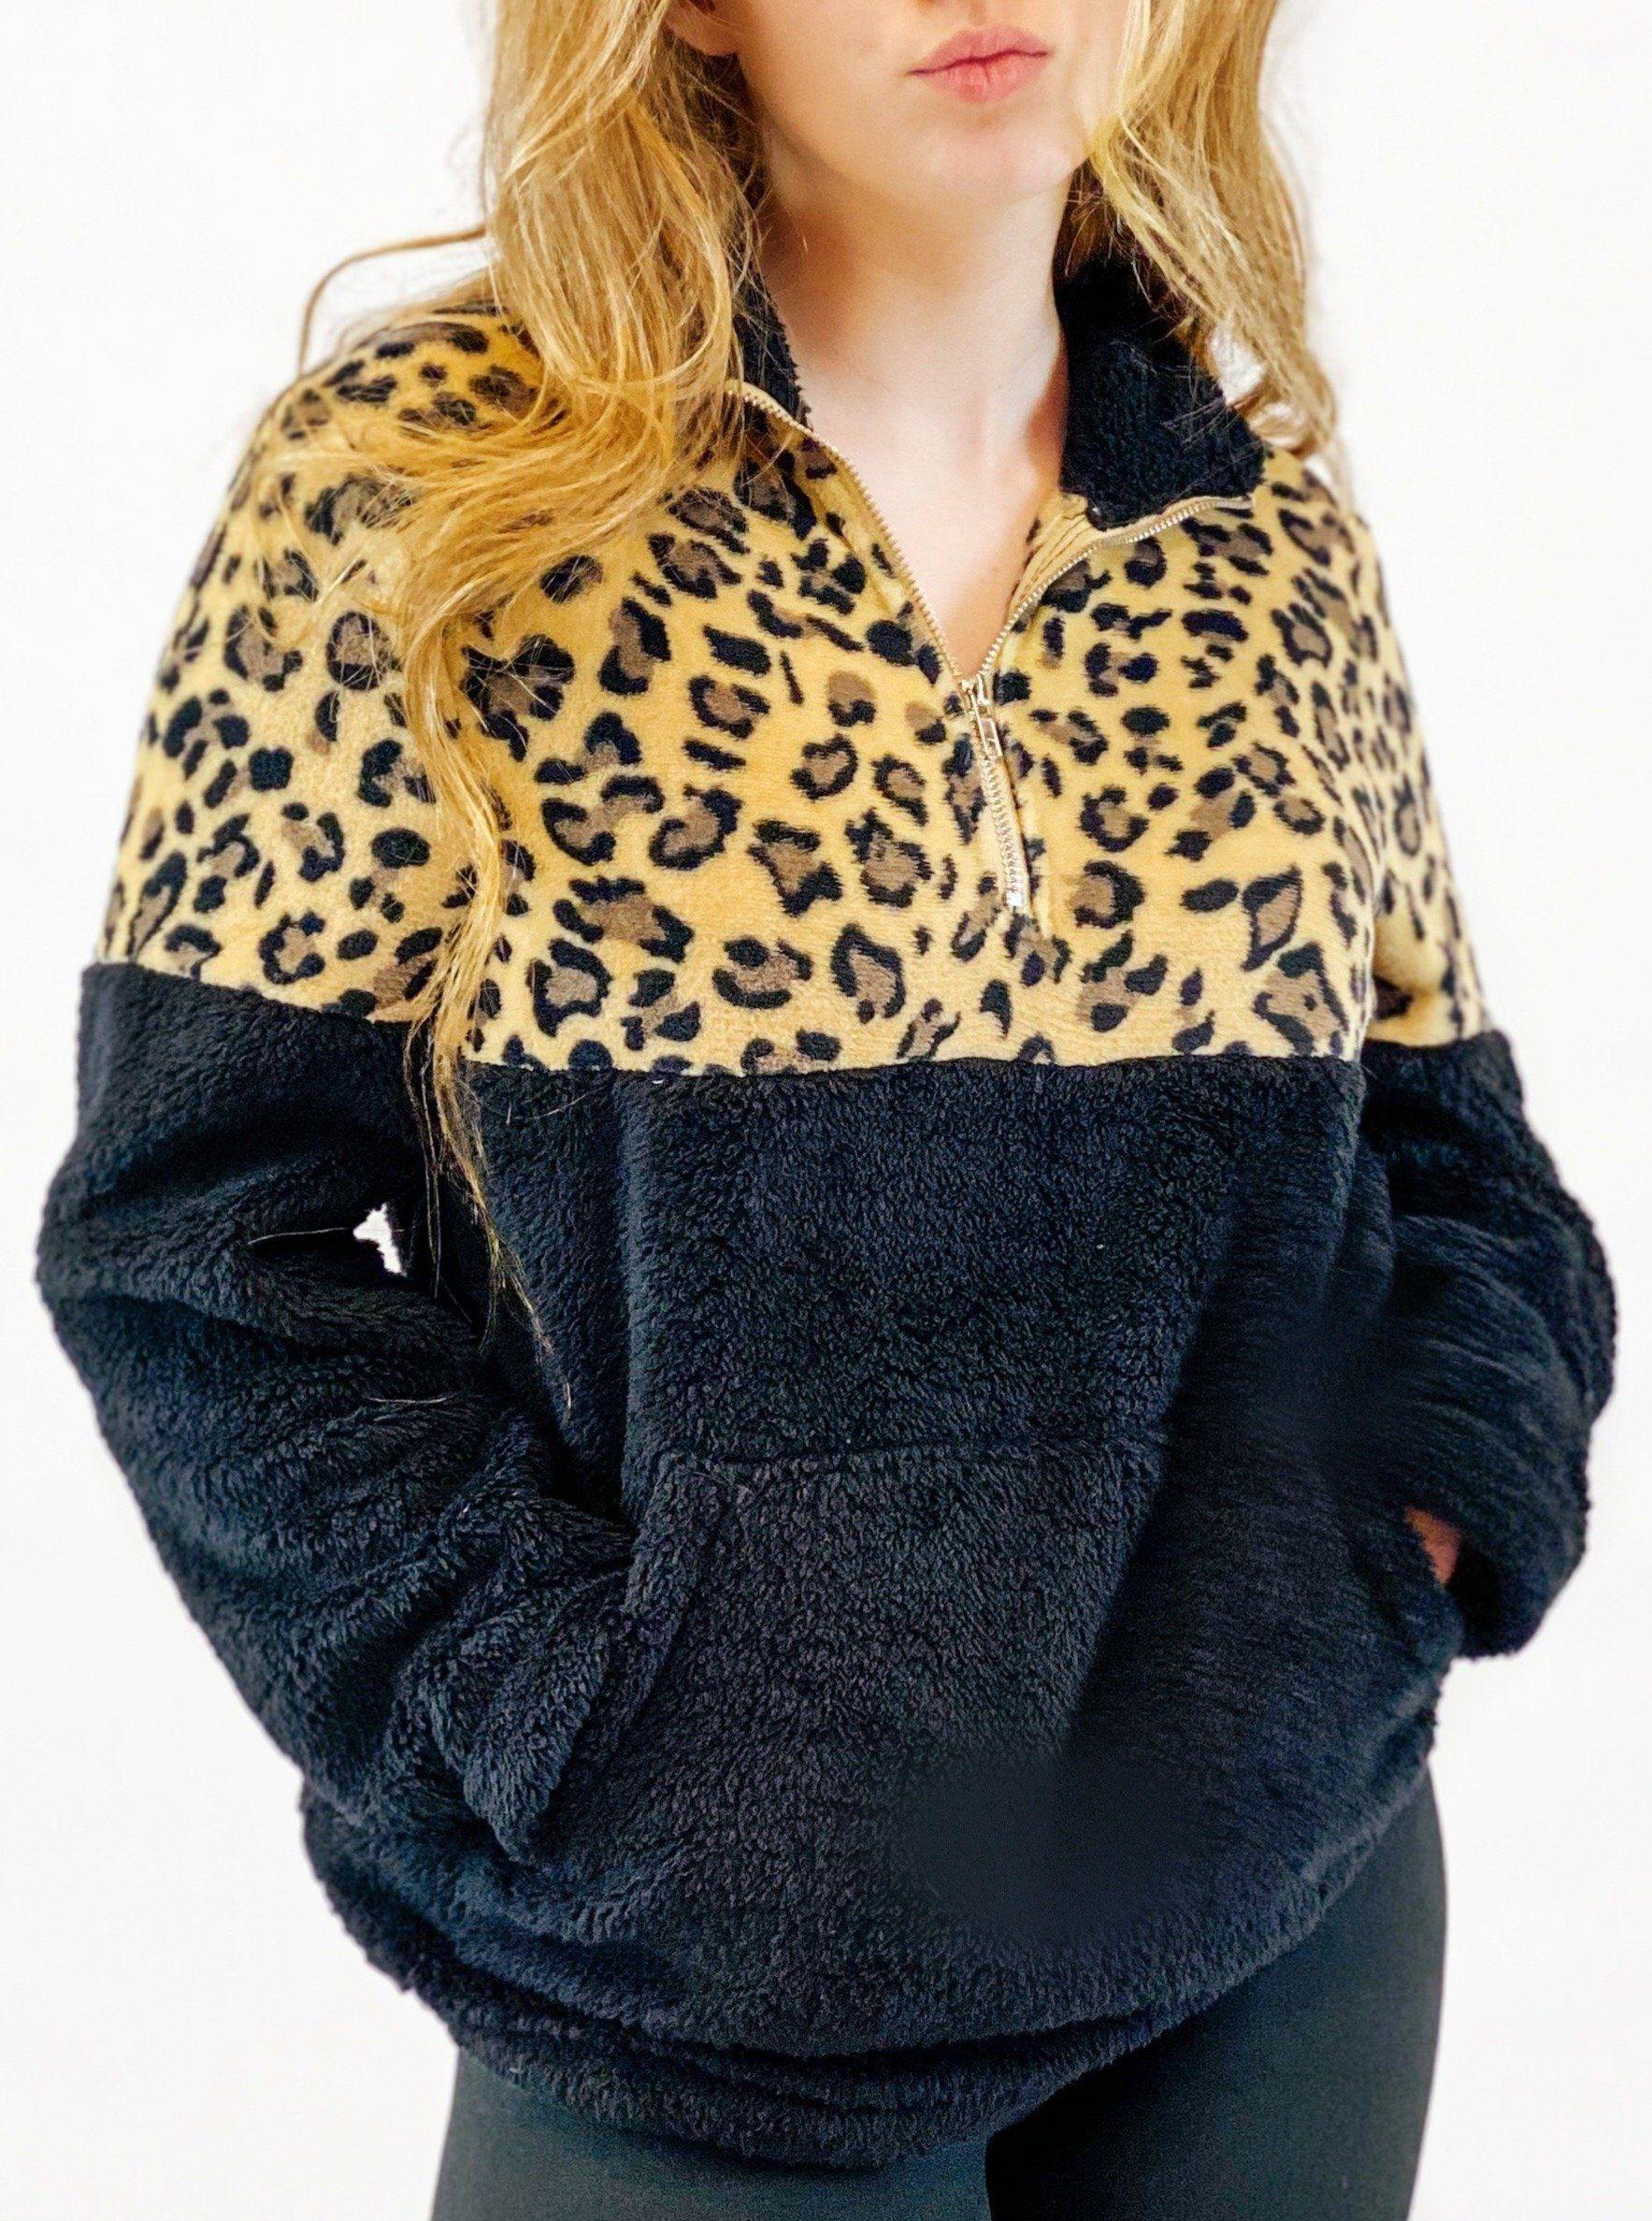 Lazy Sunday Fleece Pullover - Black - Large